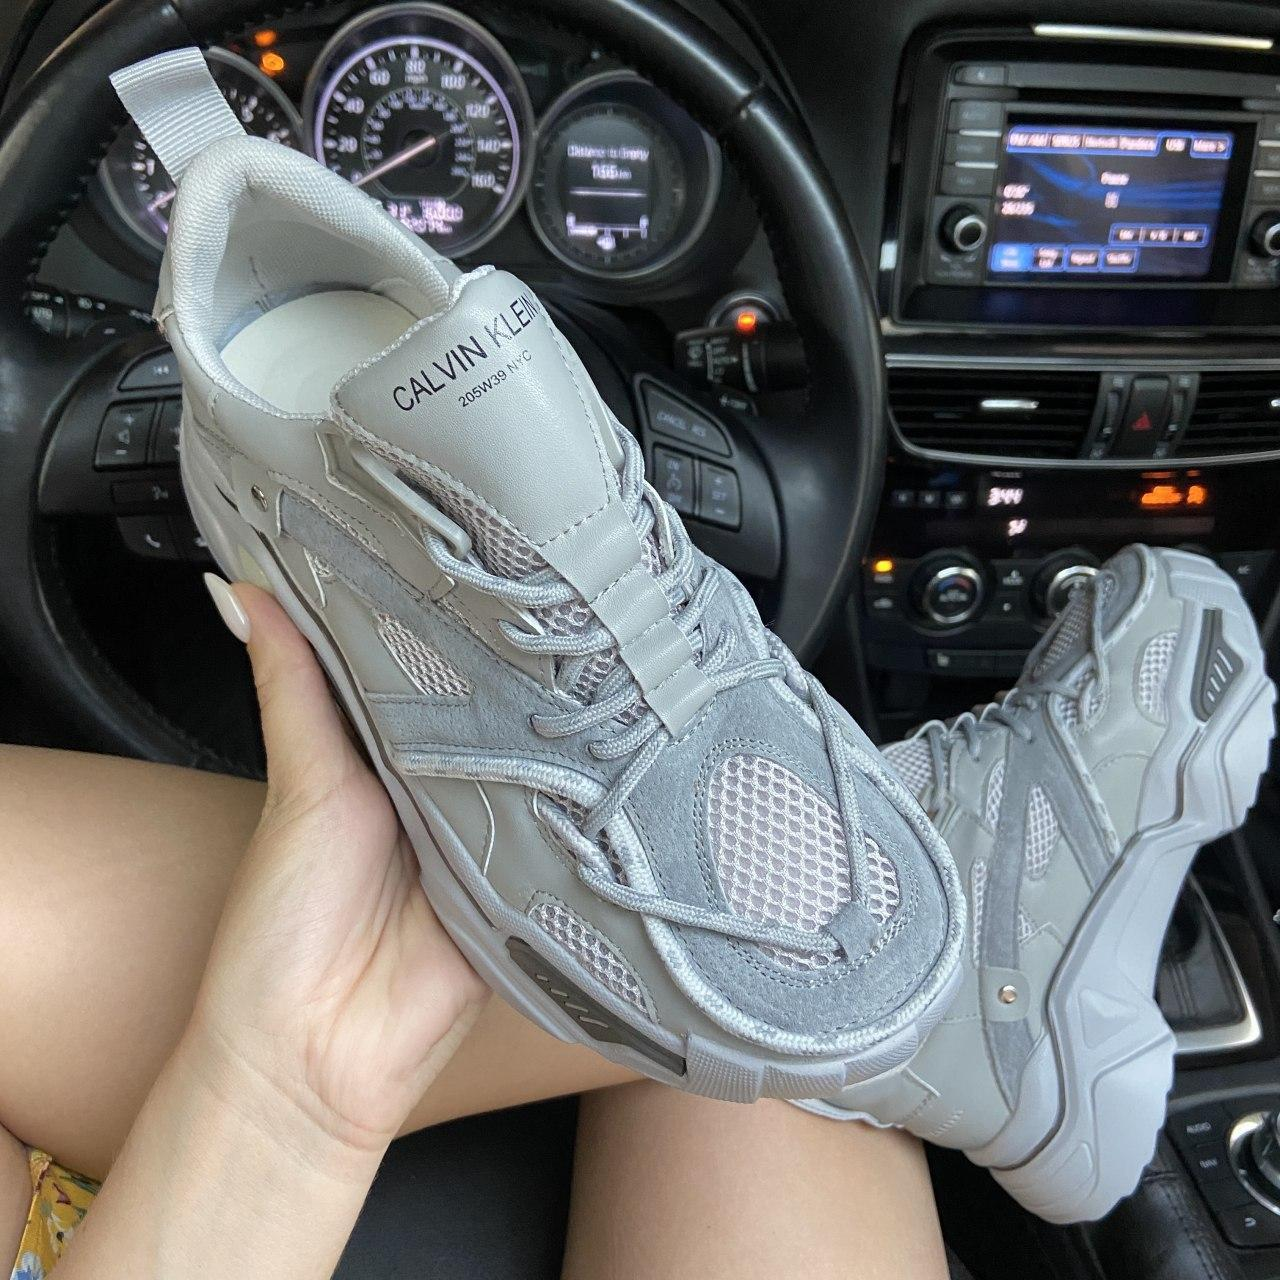 Кроссовки женские Strike 205 Gray. Стильные женские кроссовки CK.